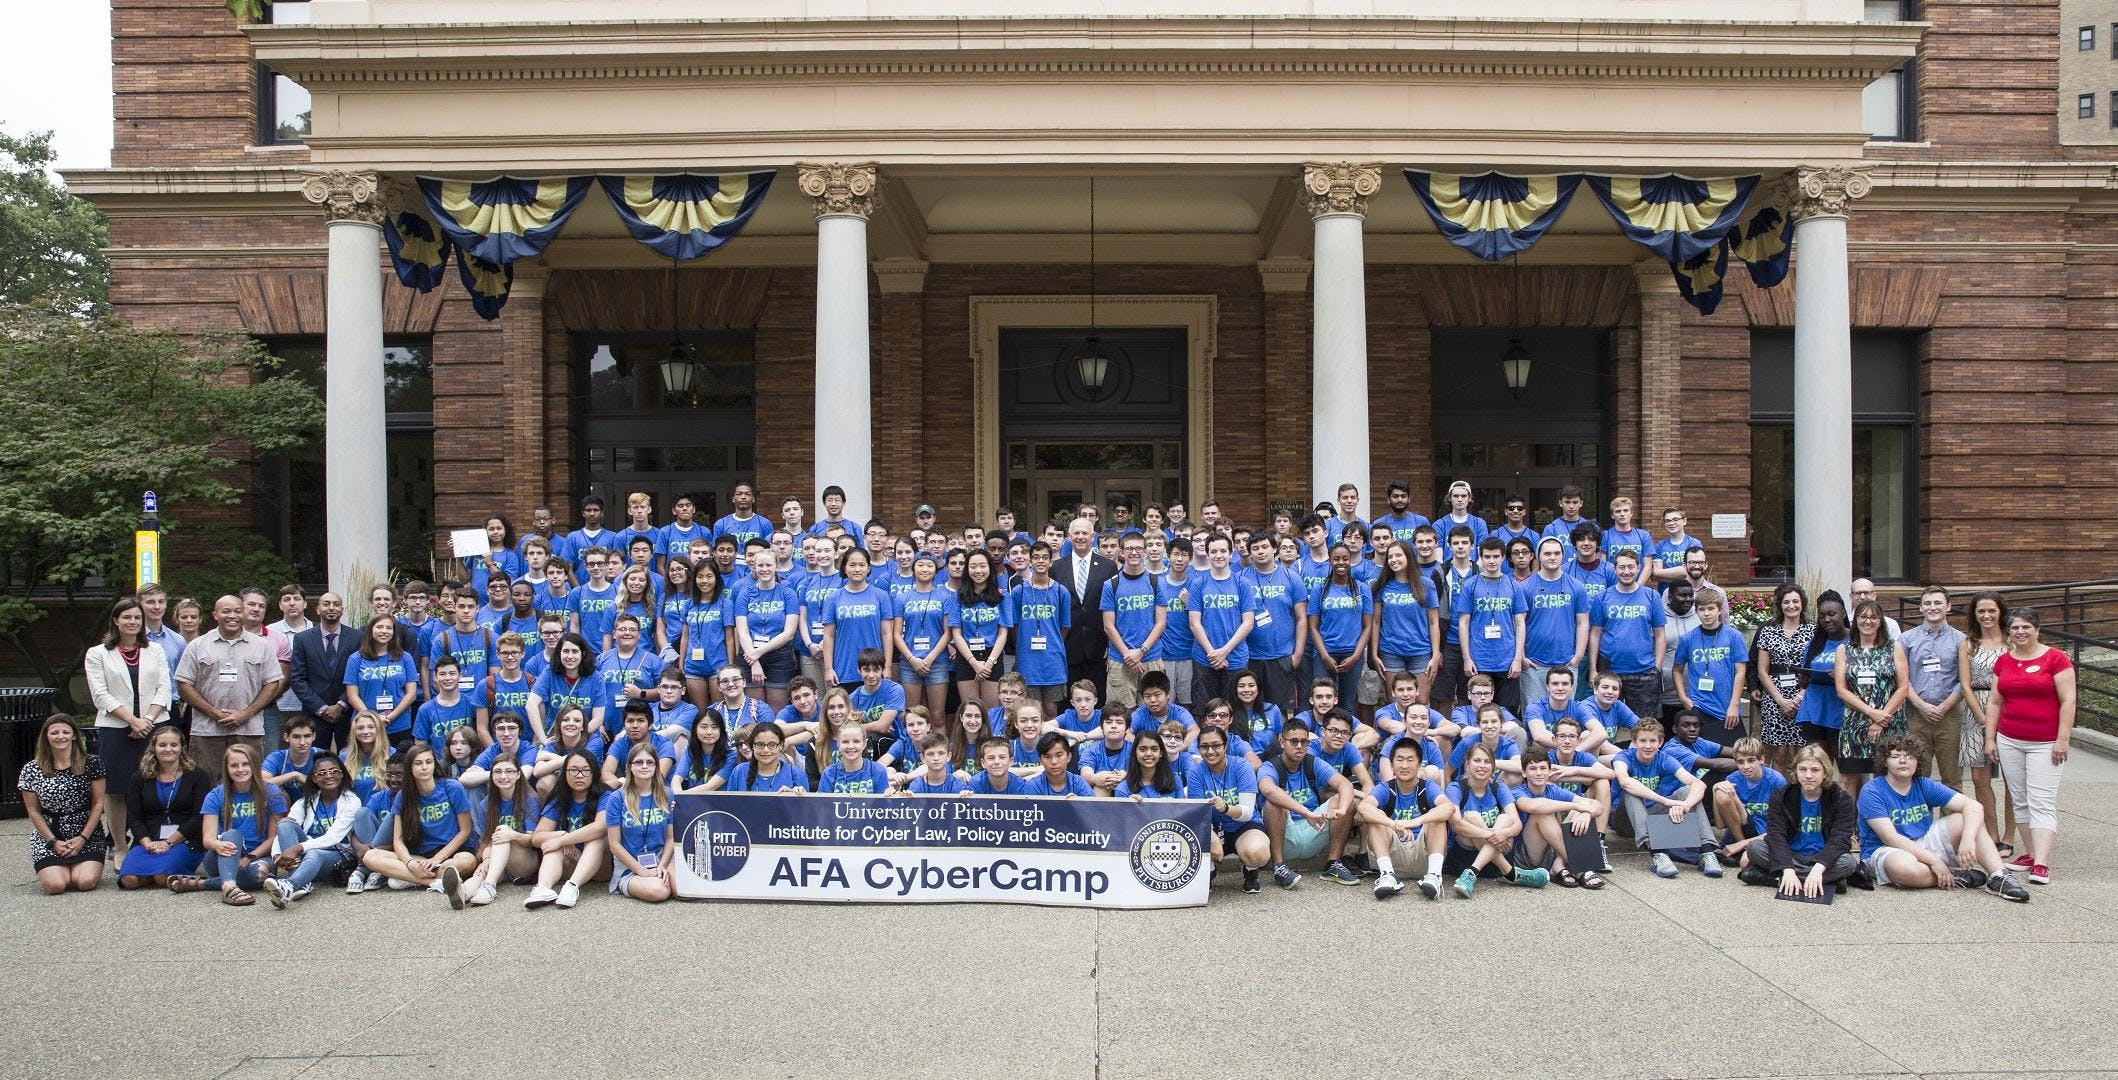 2018 AFA CyberCamp hosted by Pitt Cyber in pa